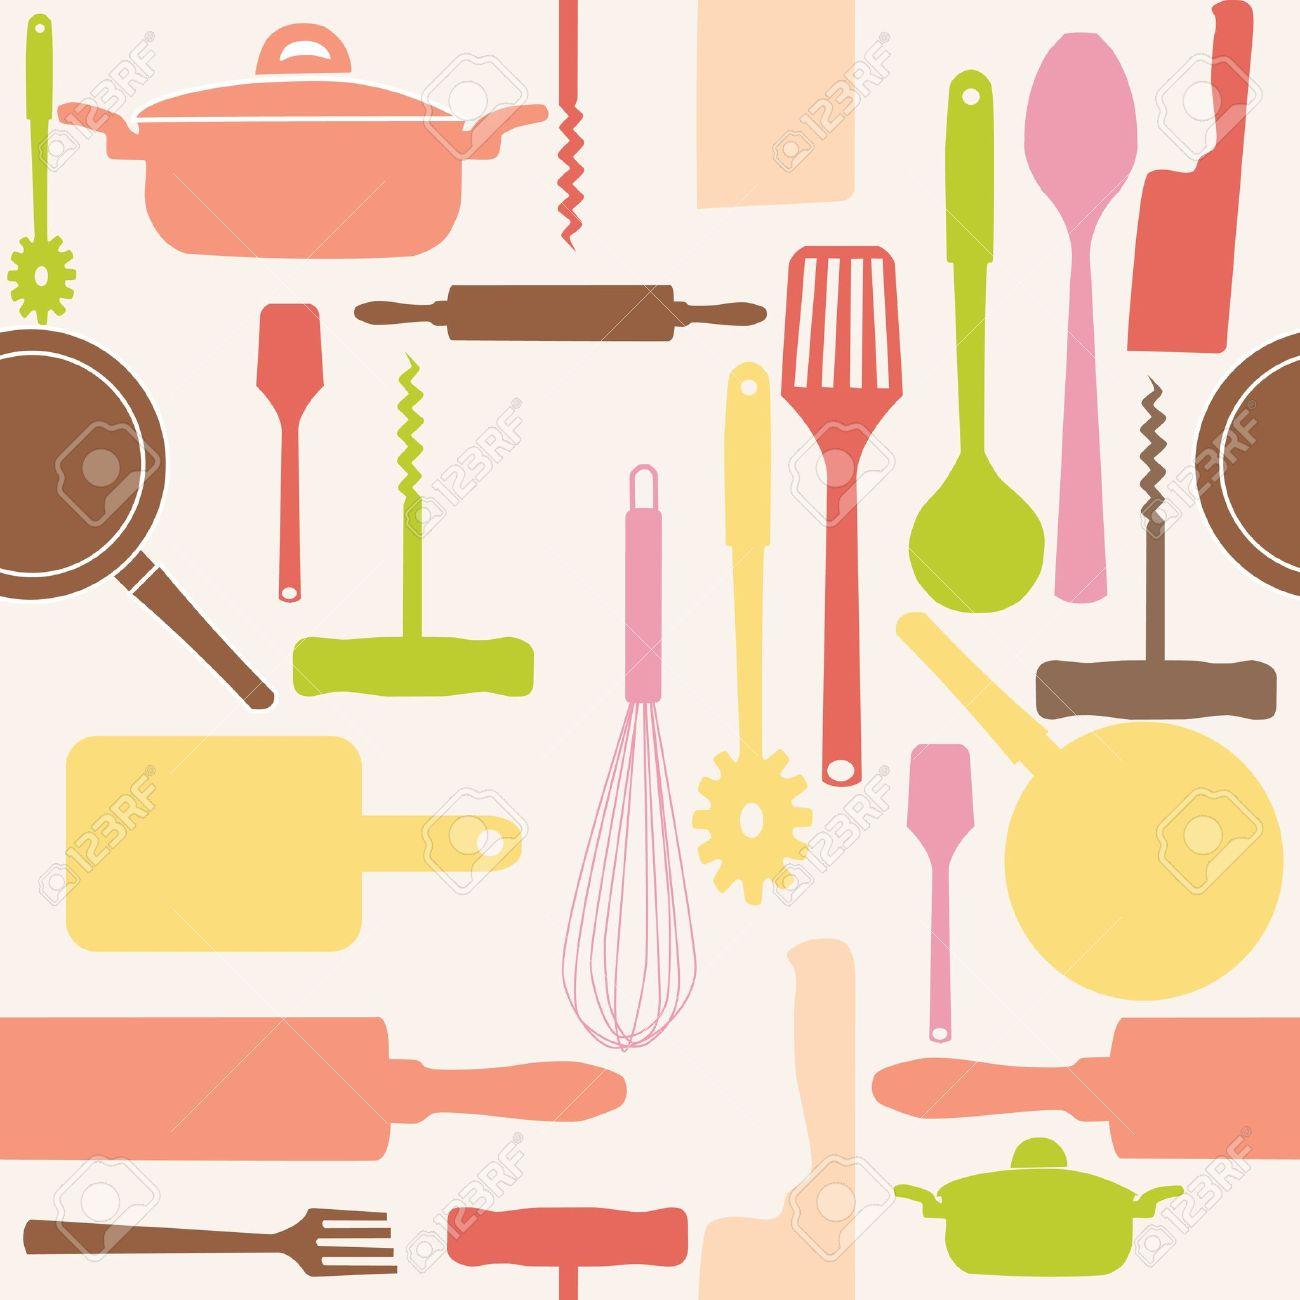 Cooking Utensils: Vector .-cooking utensils: Vector .-7